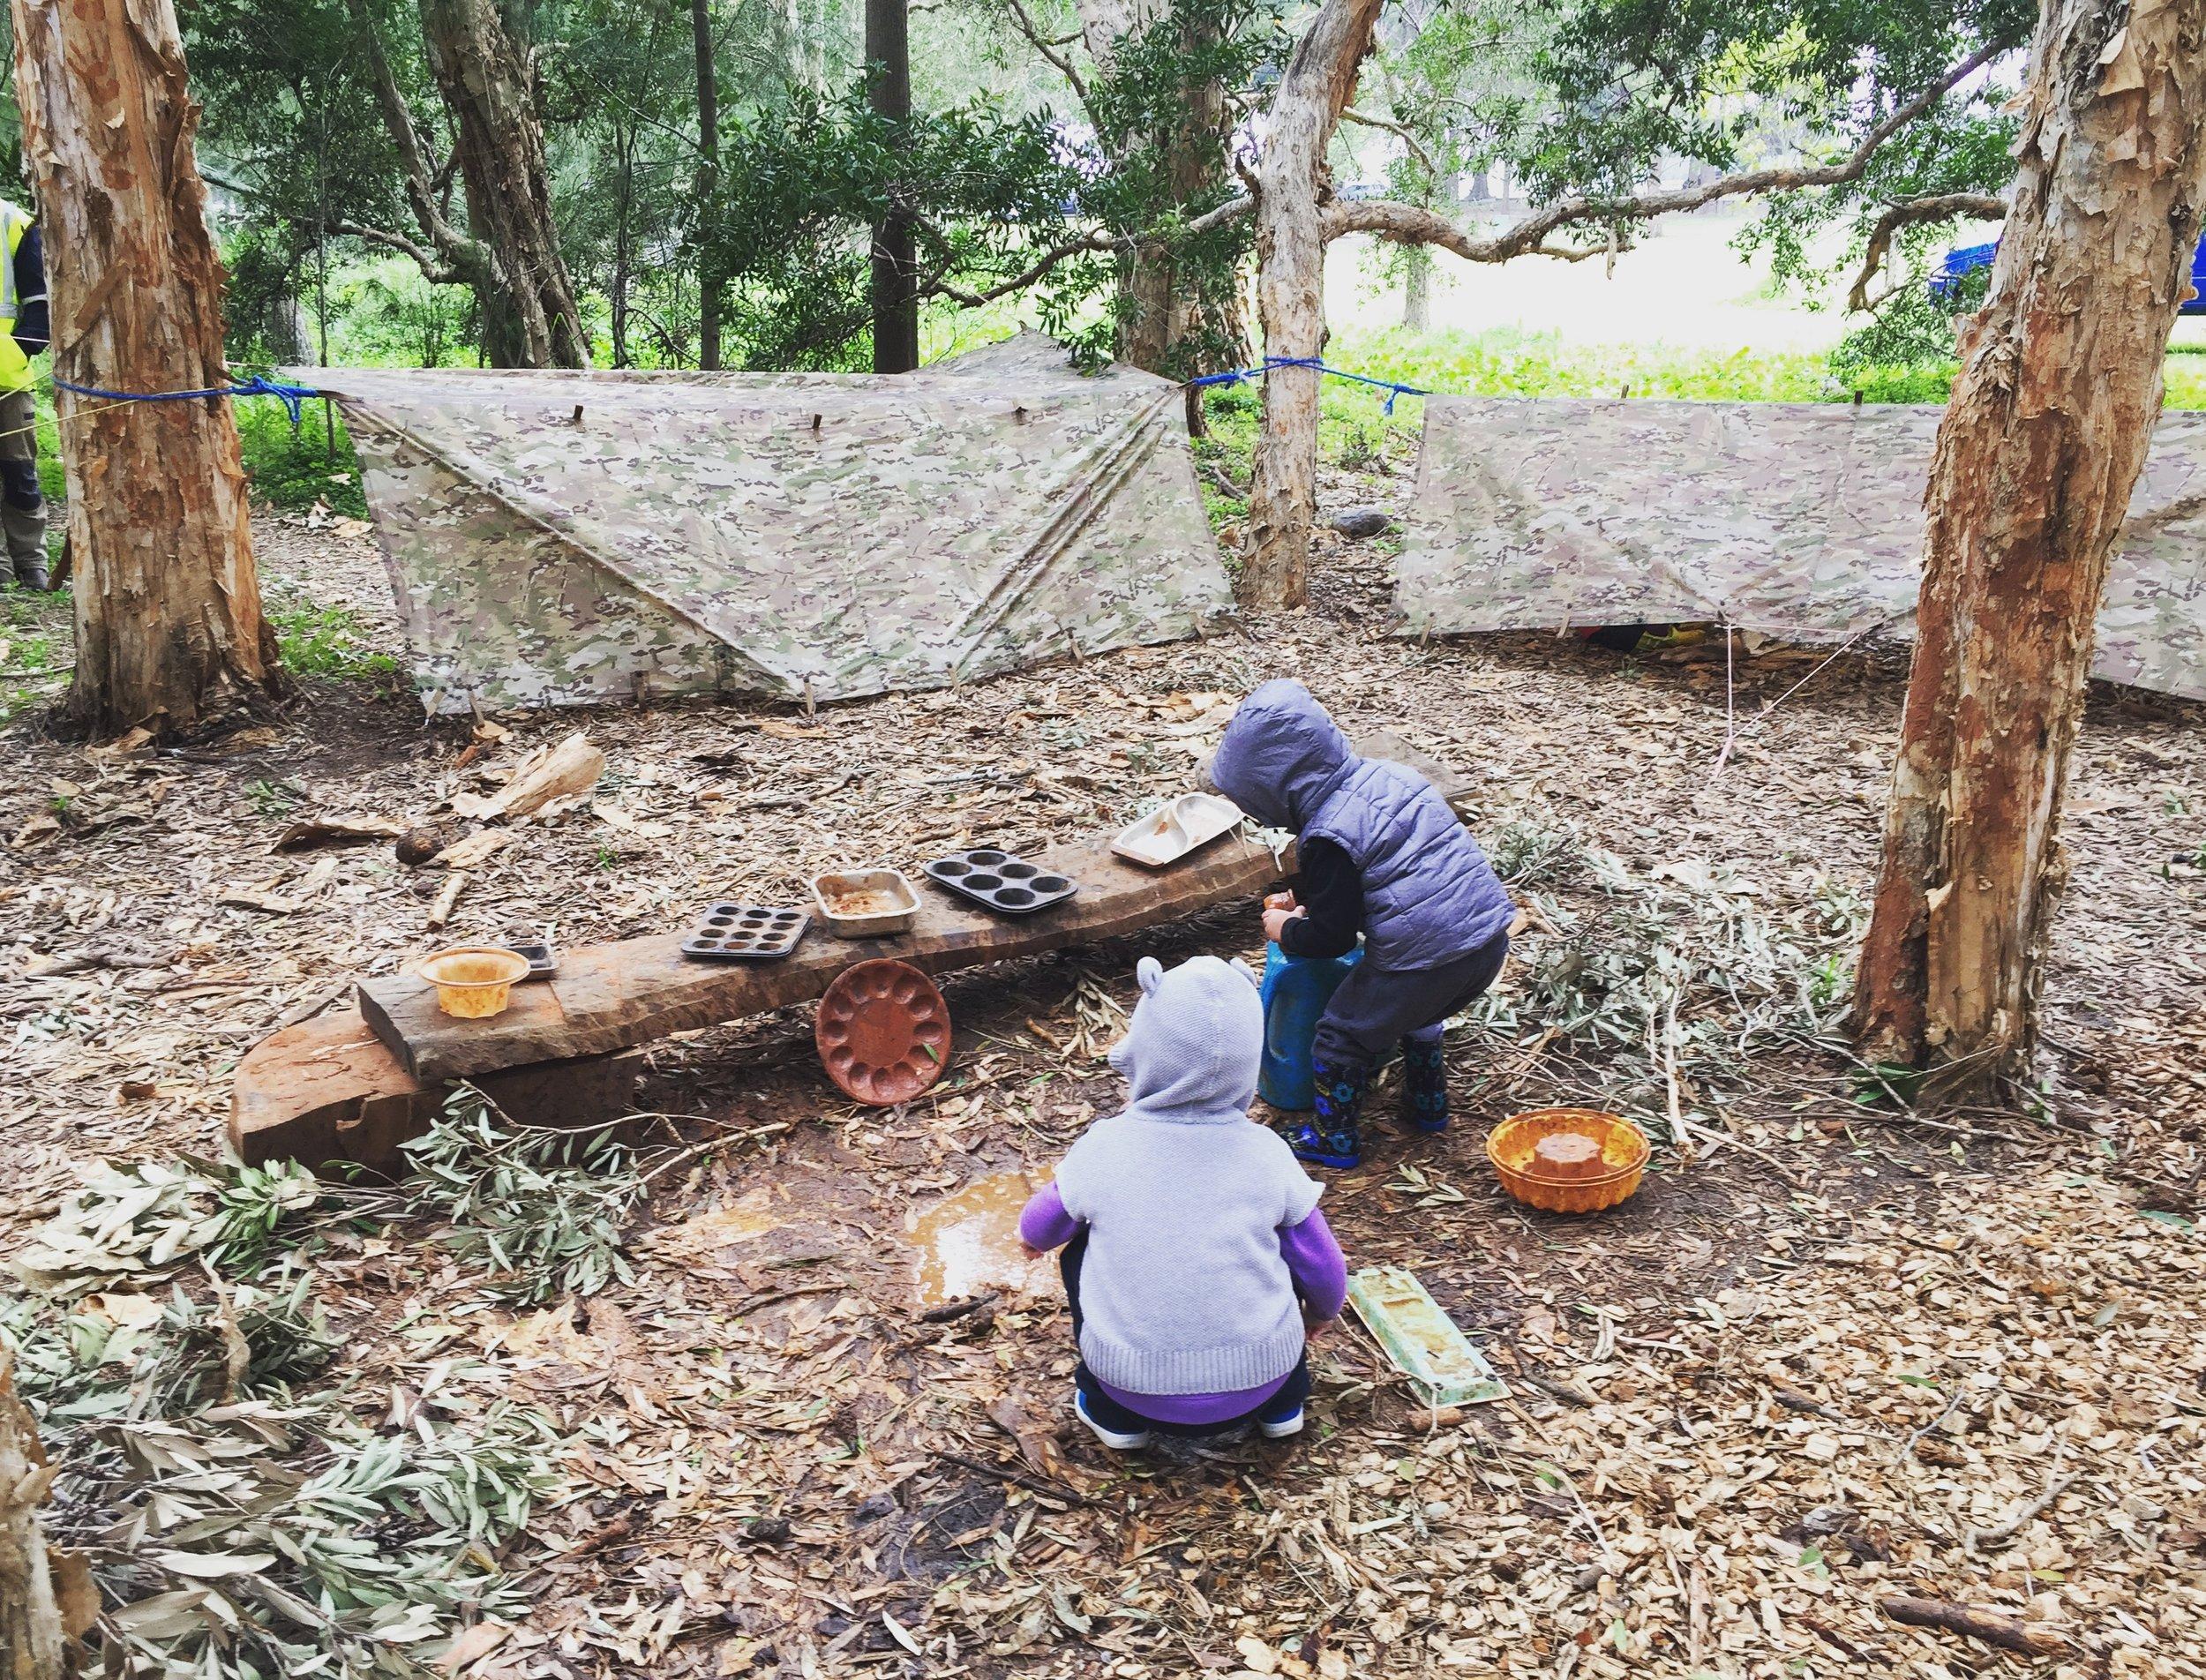 barefoot wellbeing - bush school kids - sydney australia - nature connect - mindfulness - movement - yoga - nature walks- Louise Kiddell.JPG